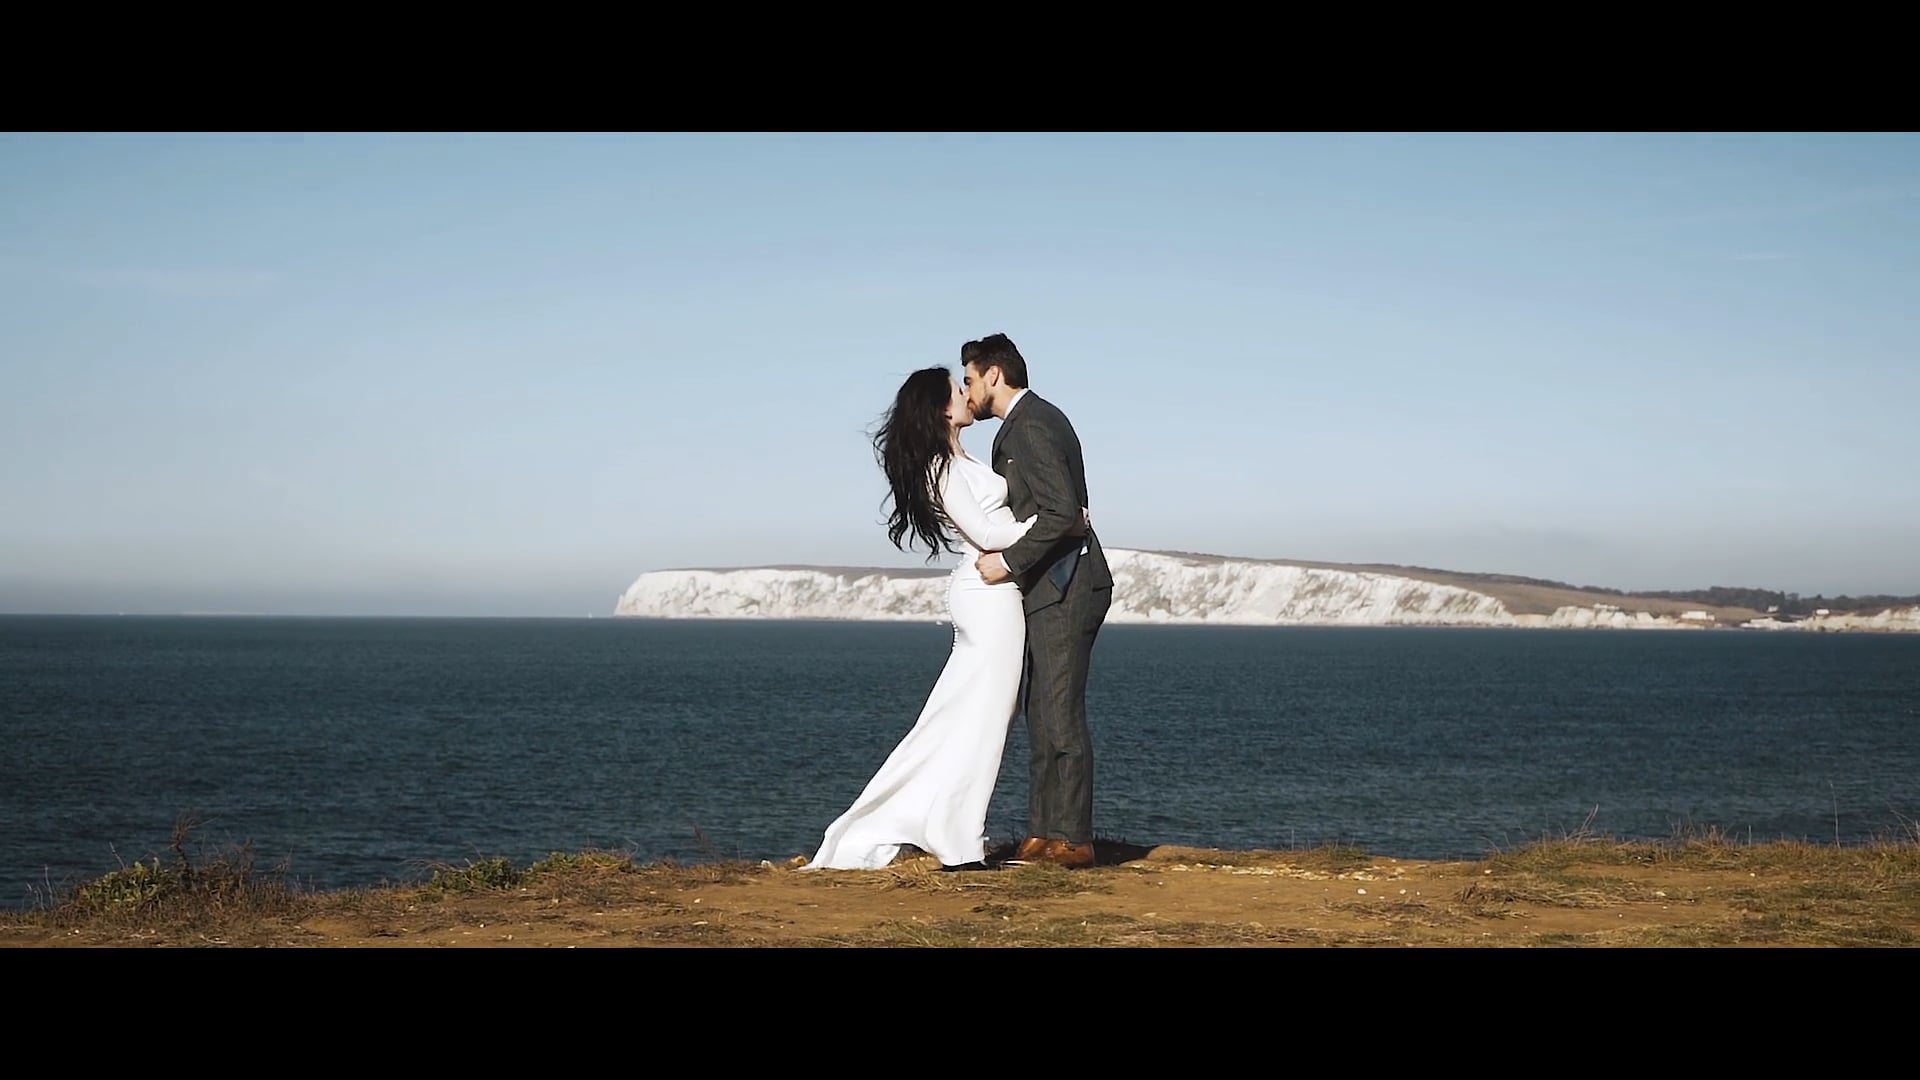 Kendall + Matt | Isle of Wight, UK